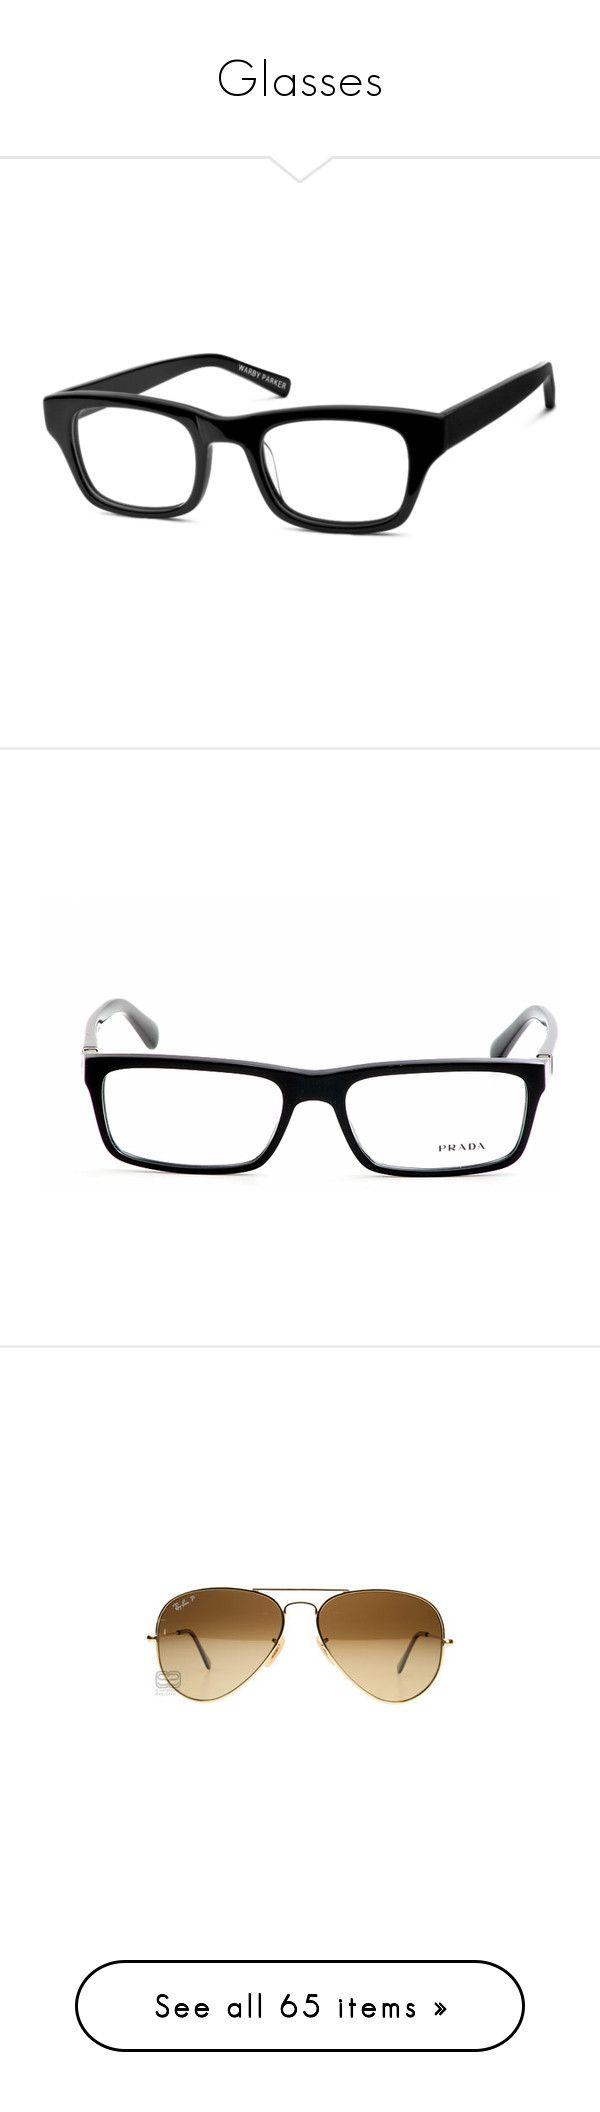 """Glasses"" by musicbeforelove ❤ liked on Polyvore featuring accessories, eyewear, eyeglasses, glasses, sunglasses, revolver black, superman glasses, warby parker eyeglasses, thick eyeglasses and warby parker eyewear"